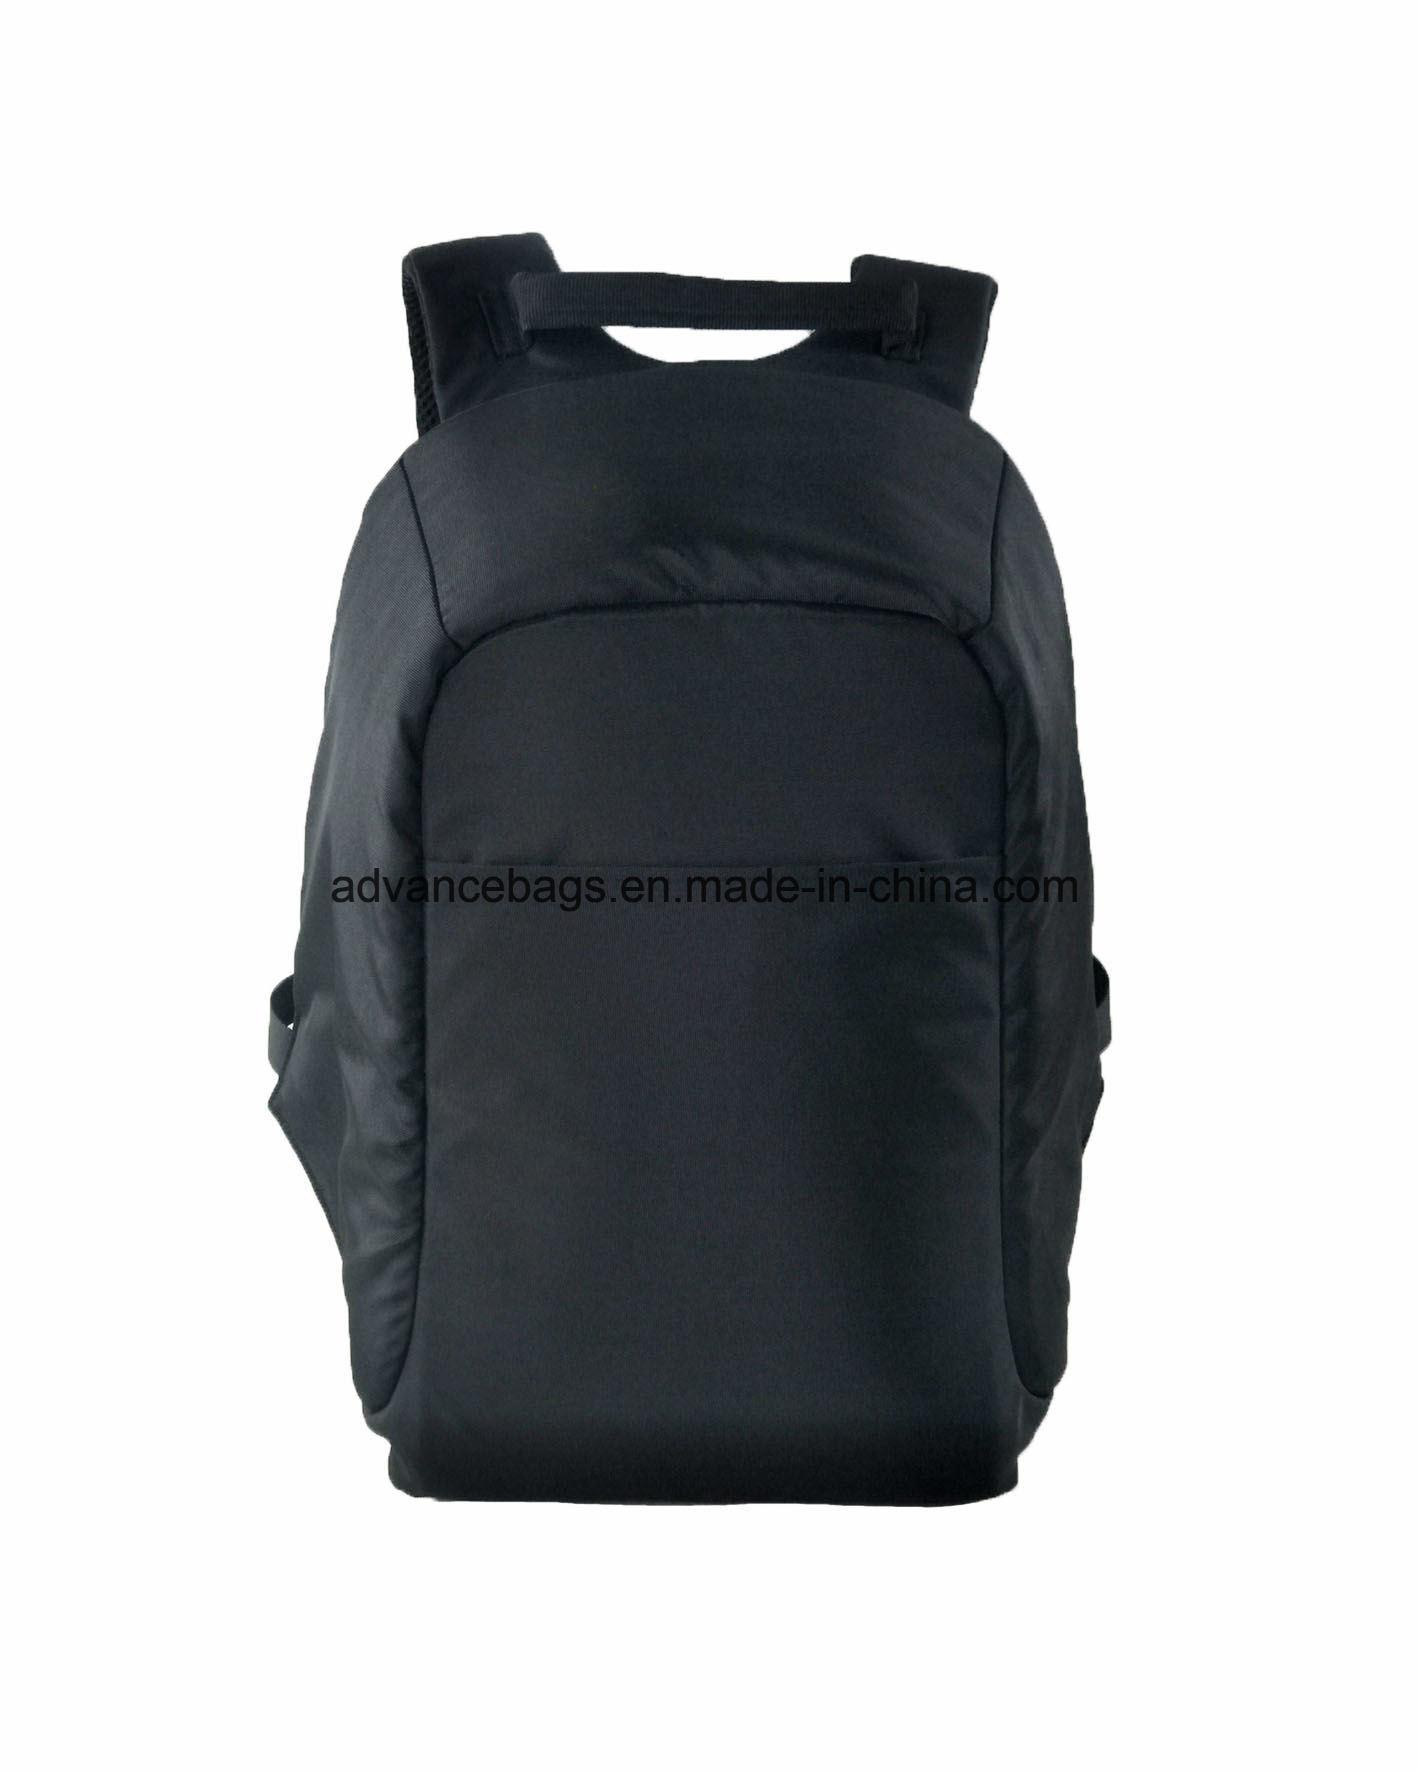 7fad56910c76 China Best Sell Bagpack Men Reflective Bag Waterproof Backpack Laptop  School Anti Aheft Backpack - China Laptop Bag